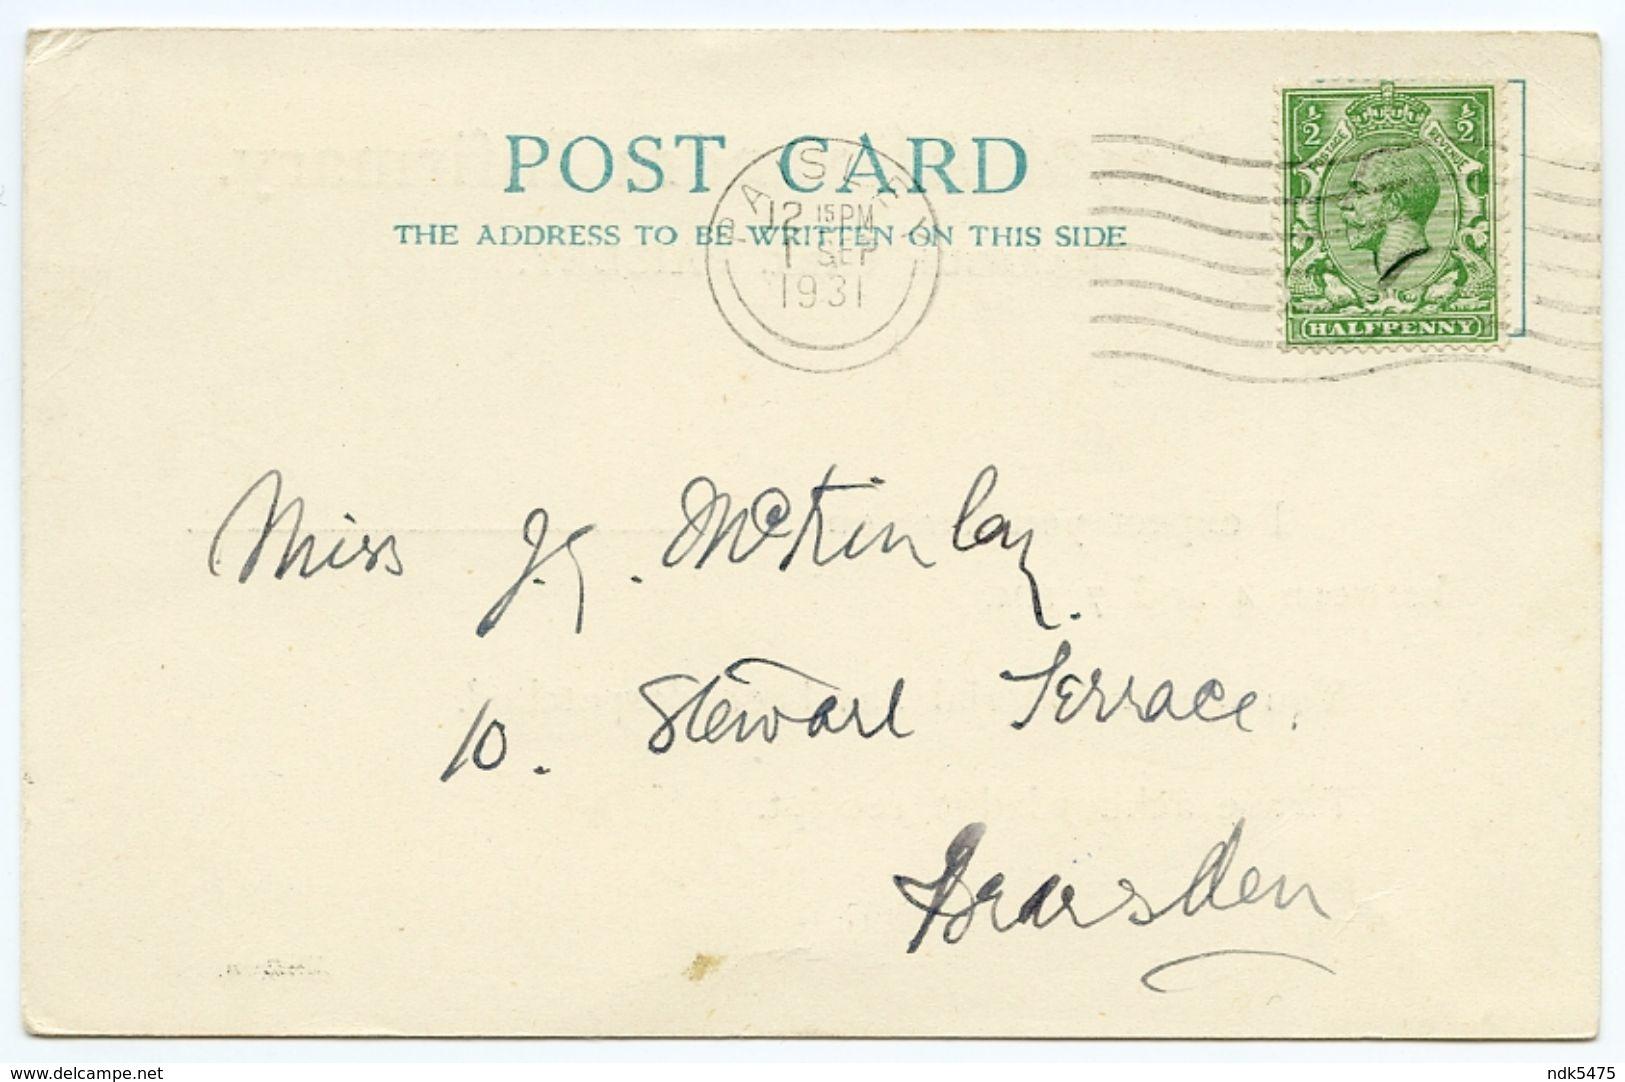 PAISLEY : THE ROYAL ALEXANDRA INFIRMARY, BARBOUR PARK - MATRON'S CARD - Renfrewshire